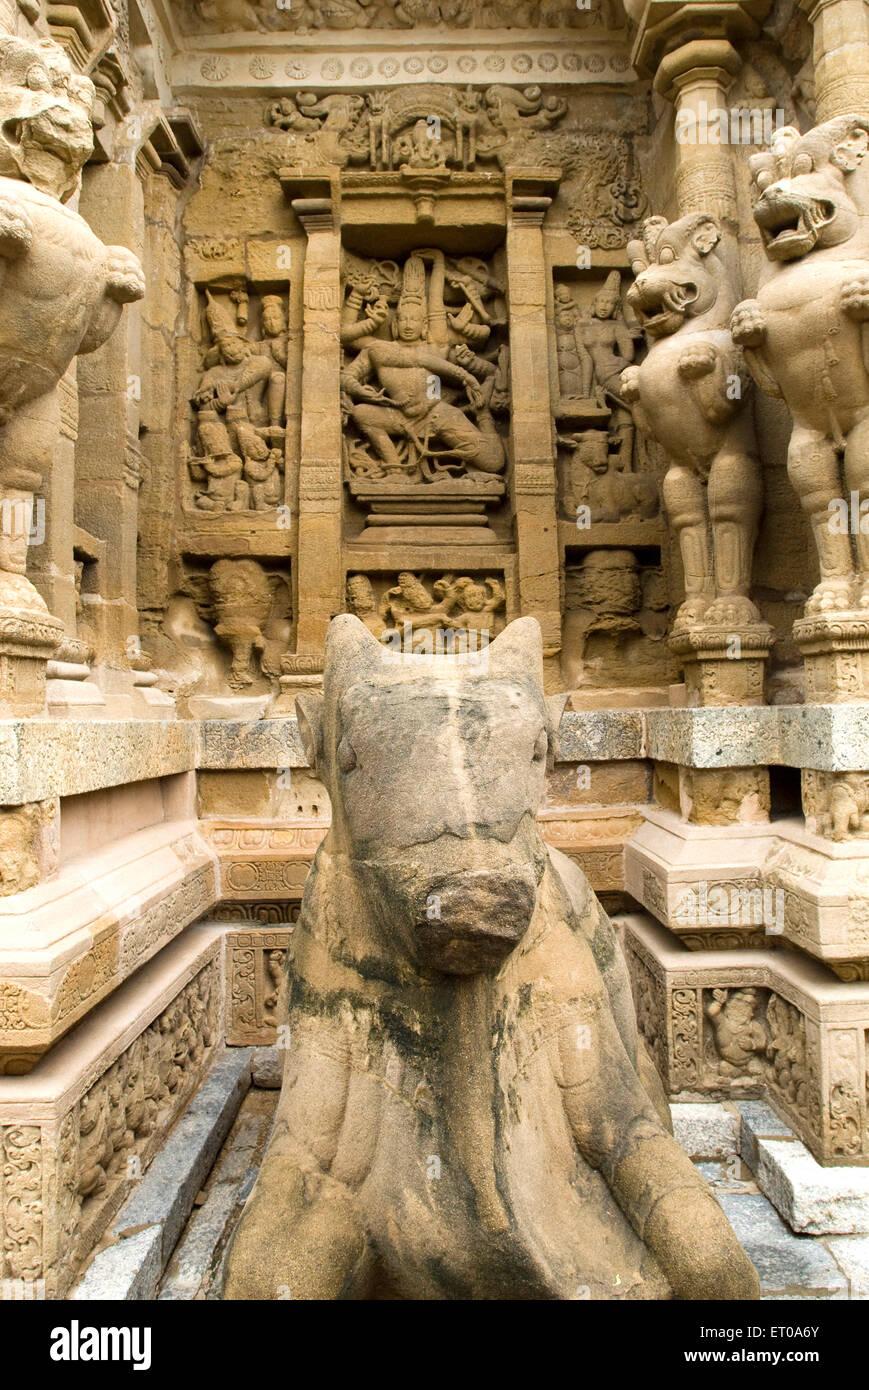 Temple de Kailasanatha roi Pallava Narasimhavarman grès; Kanchipuram Tamil Nadu Inde; Banque D'Images